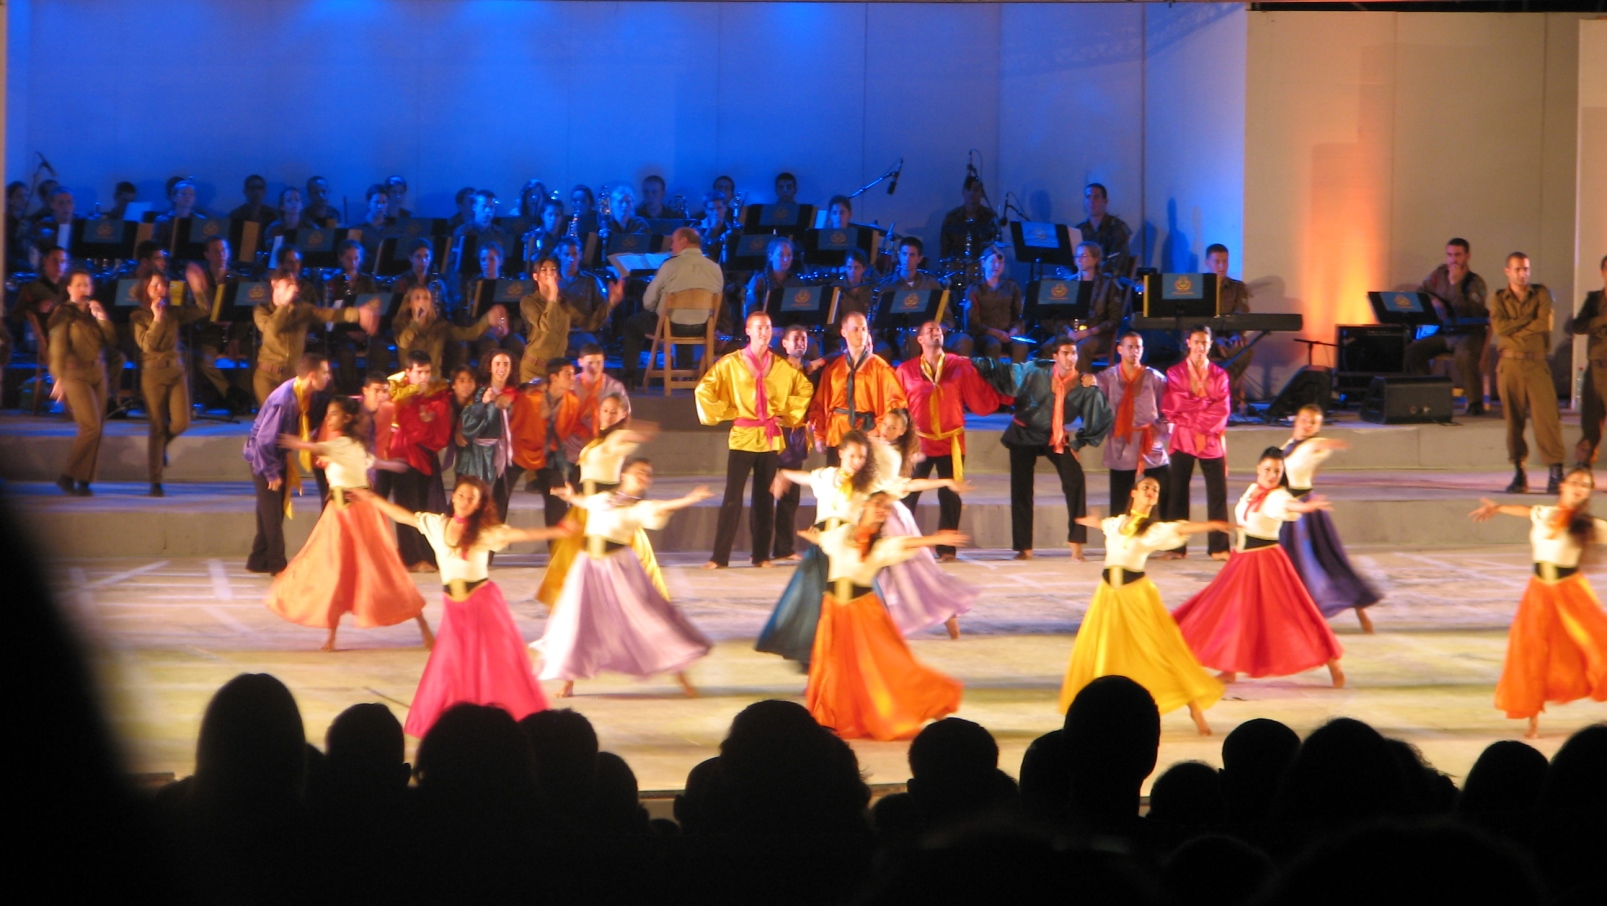 Photo of Karmiel Dance Festival via Wikimedia Commons.